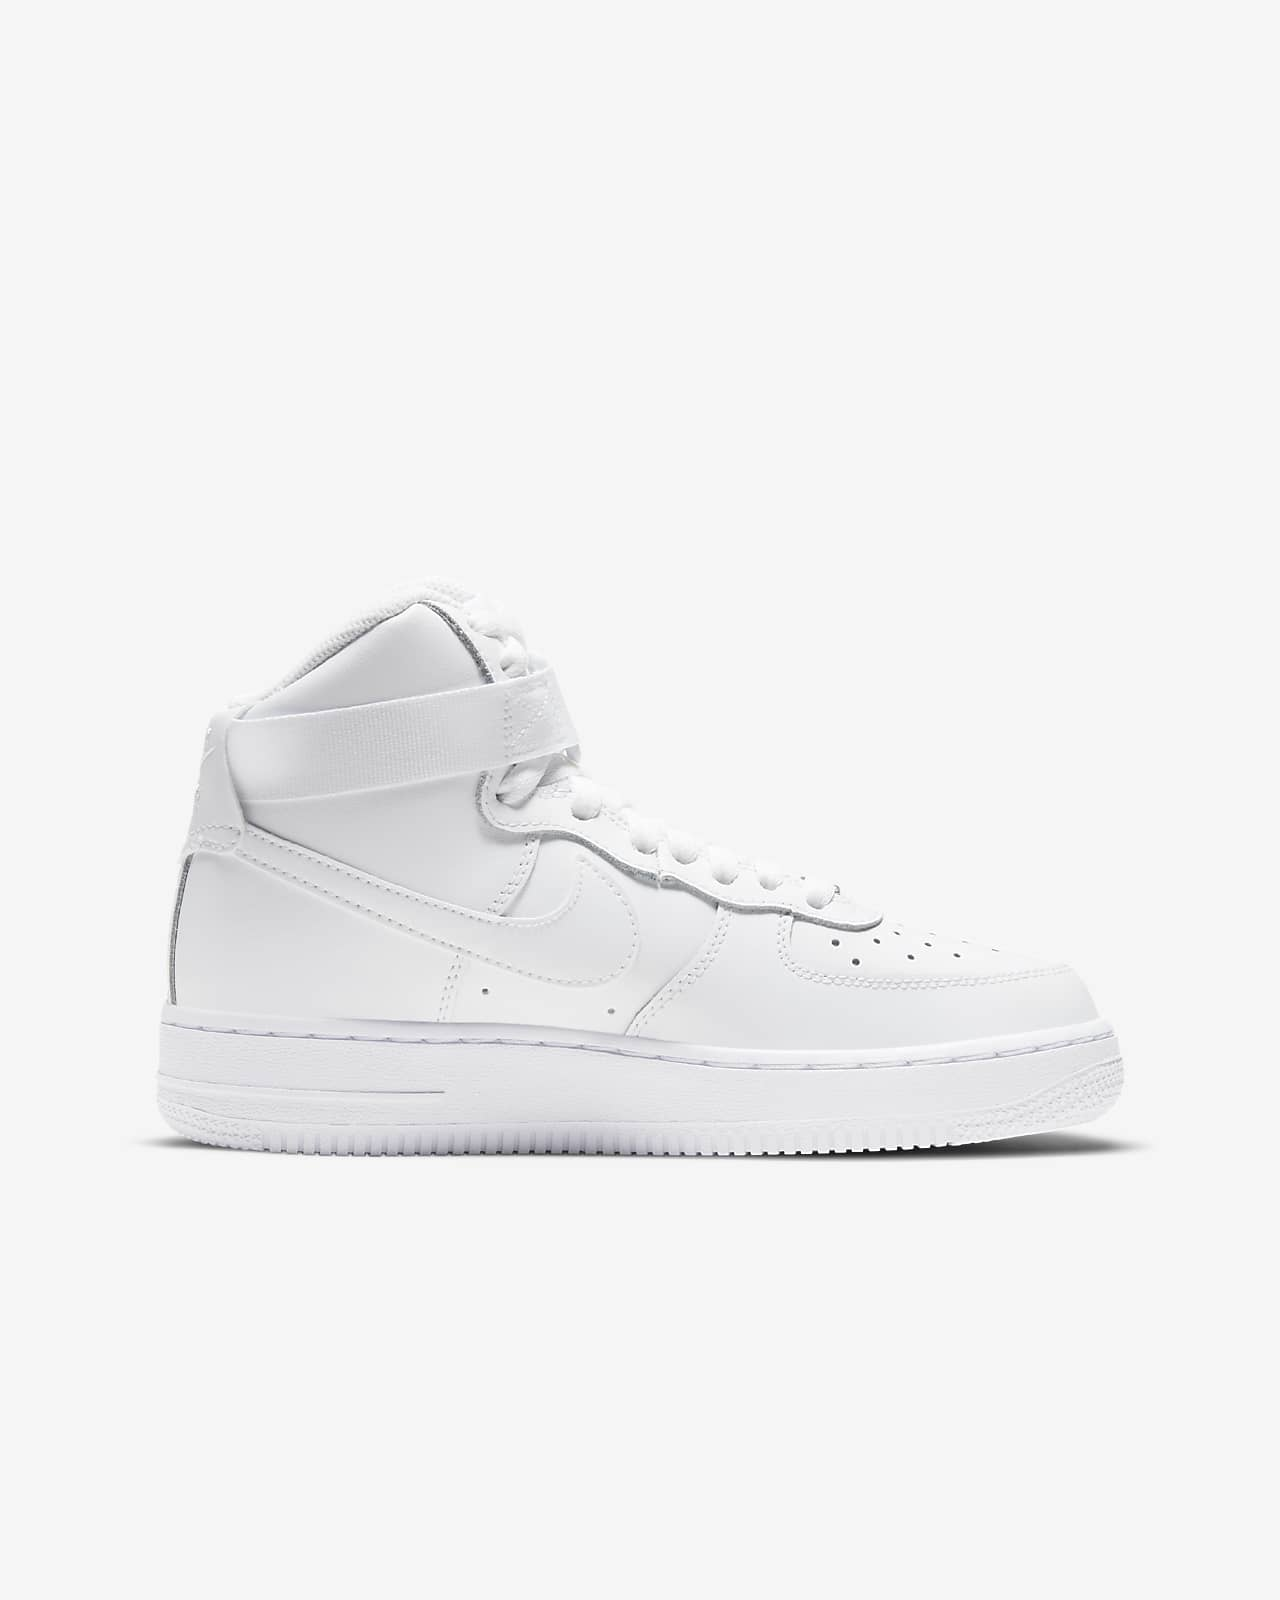 Nike Air Force 1 High LE Big Kids' Shoes